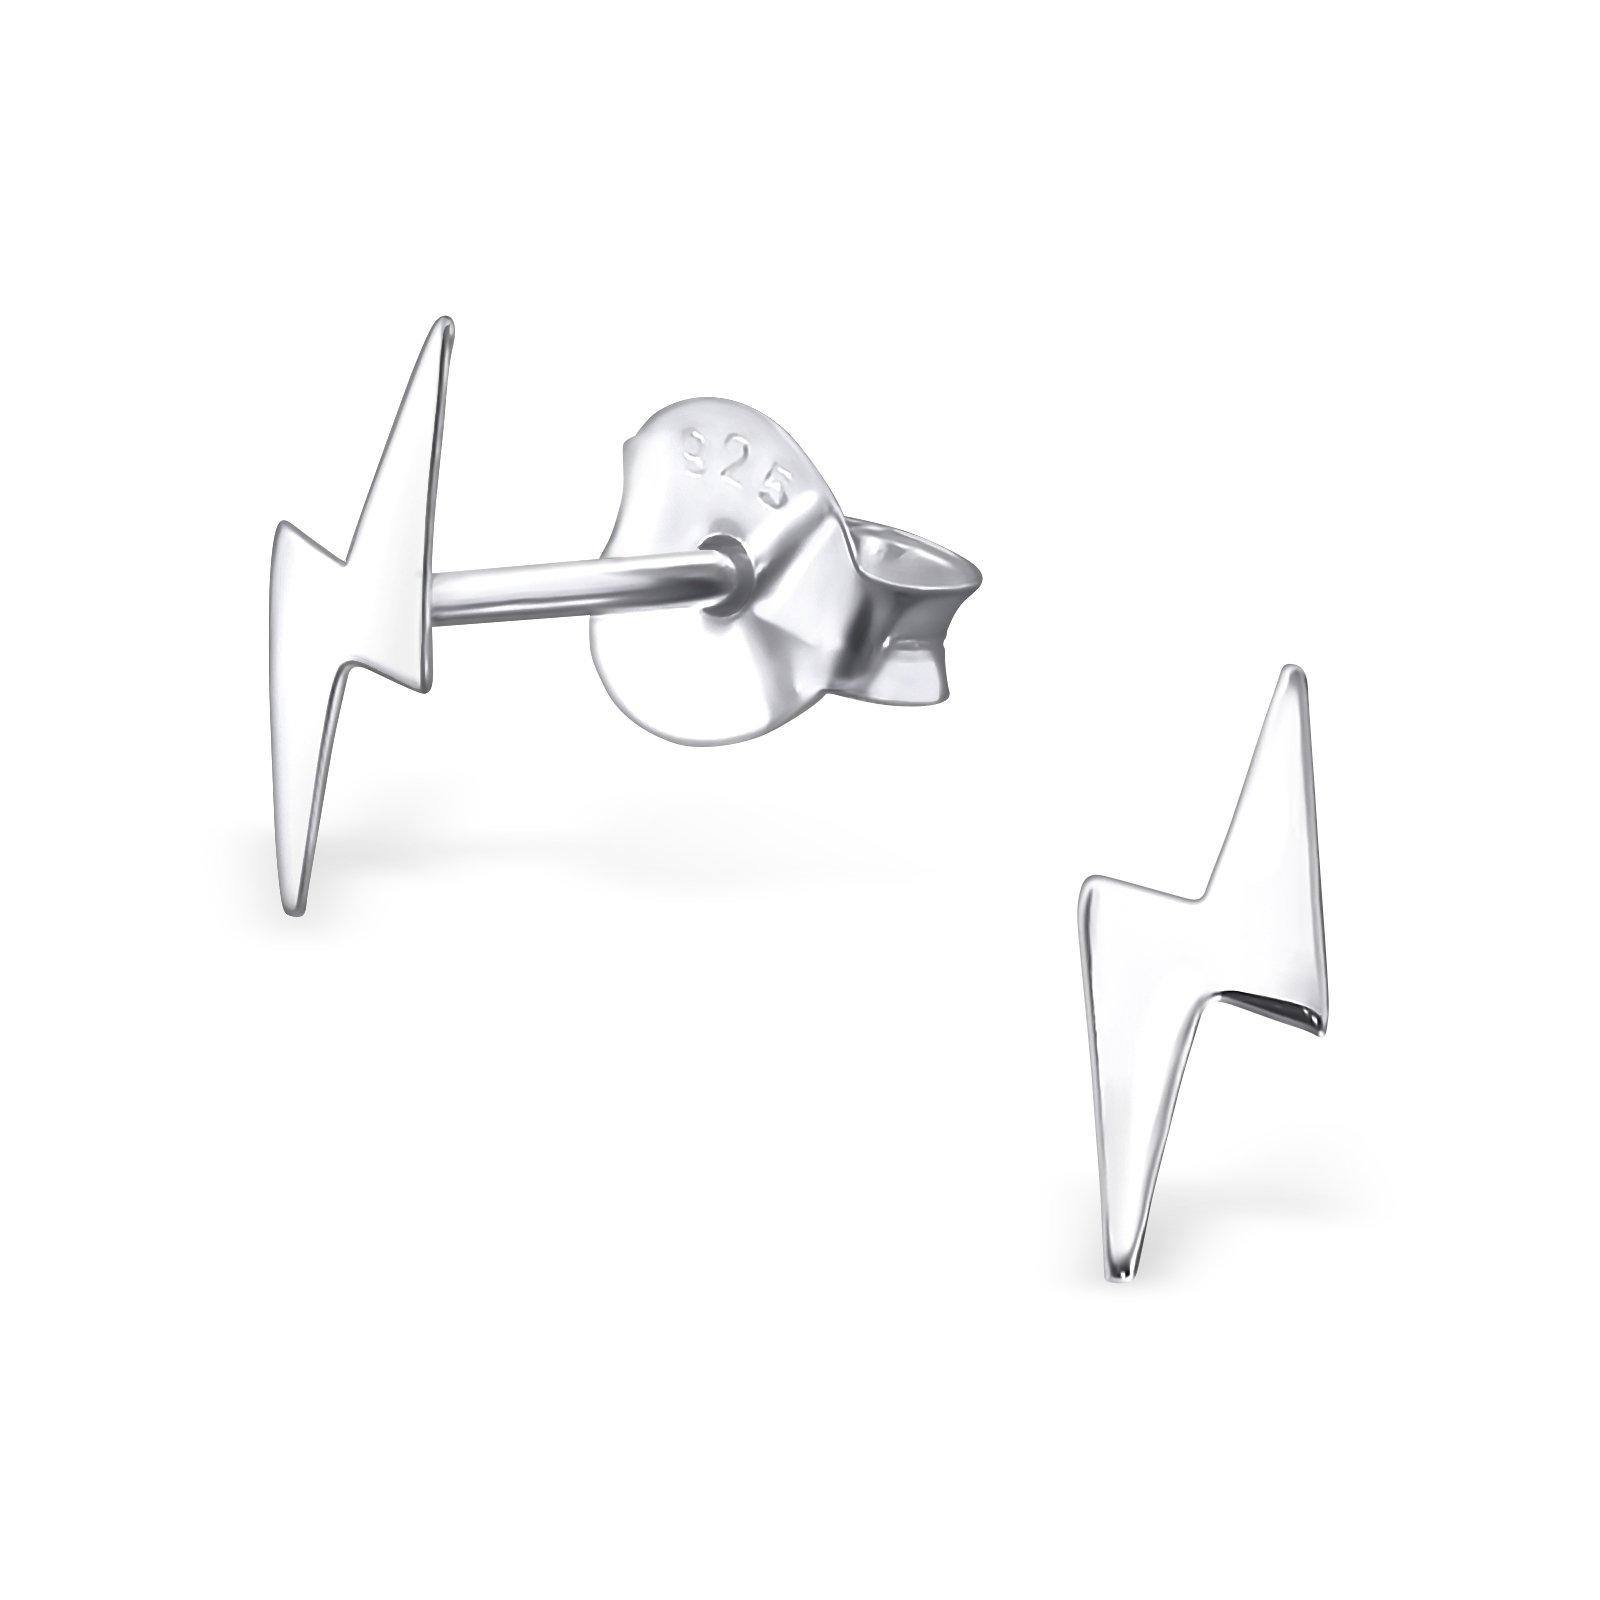 Hypoallergenic Lightning Bolt Stud Earrings for Girls (Nickel Free and Safe for Sensitive Ears)